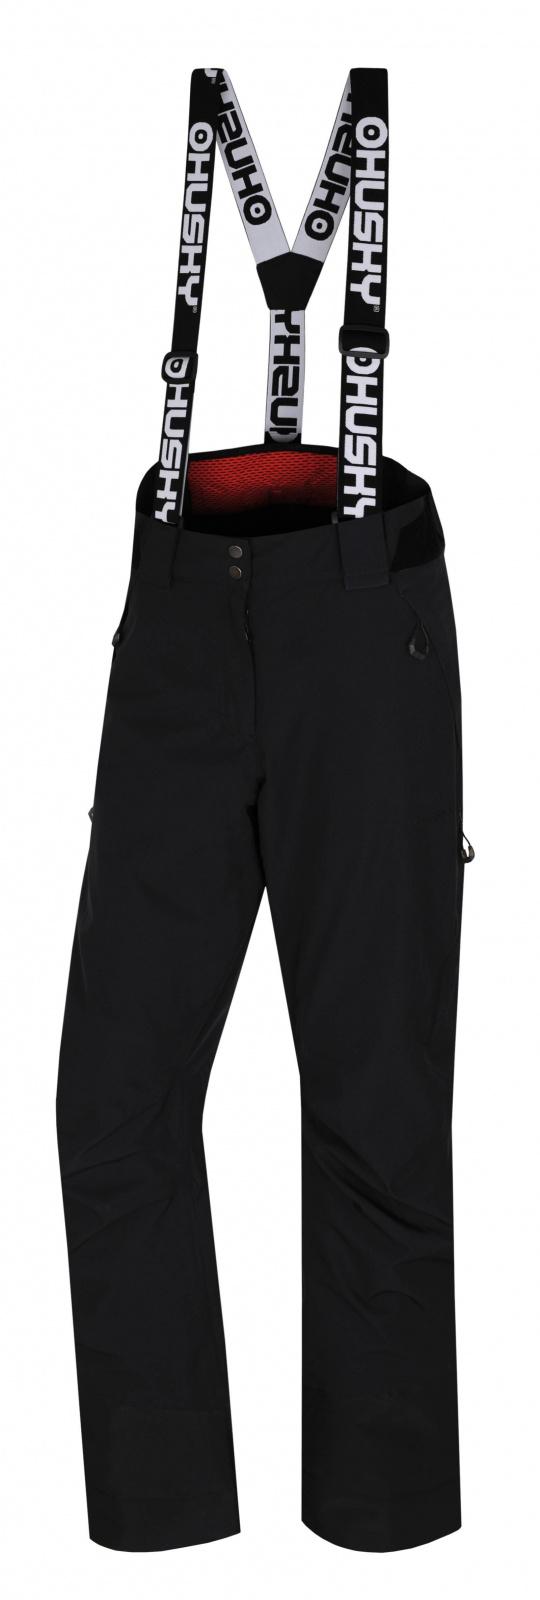 Husky Mitaly L čierna, XL Dámske lyžiarske nohavice